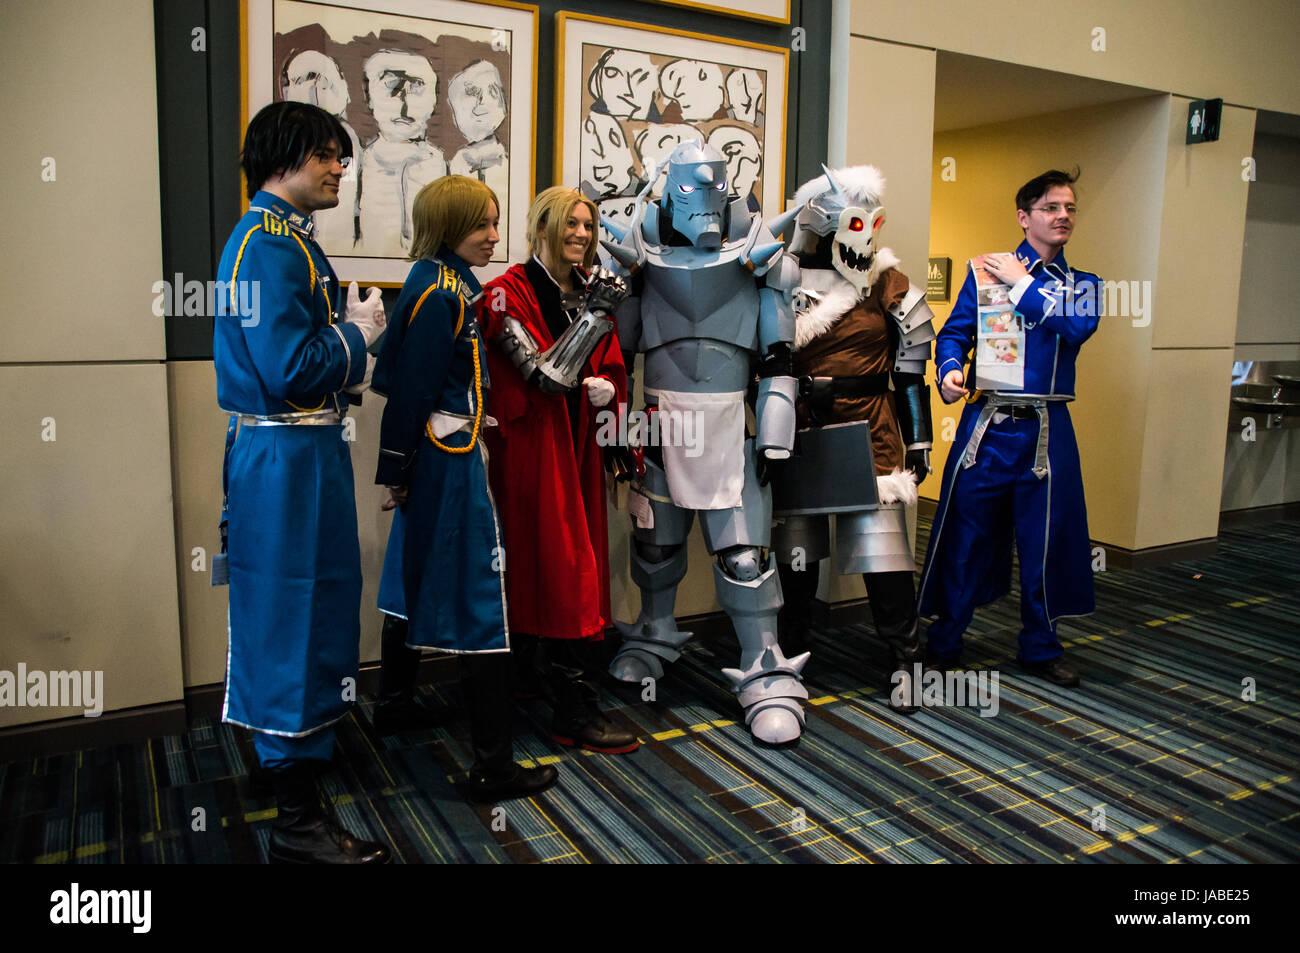 Fullmetal Alchemist cosplayers - Stock Image